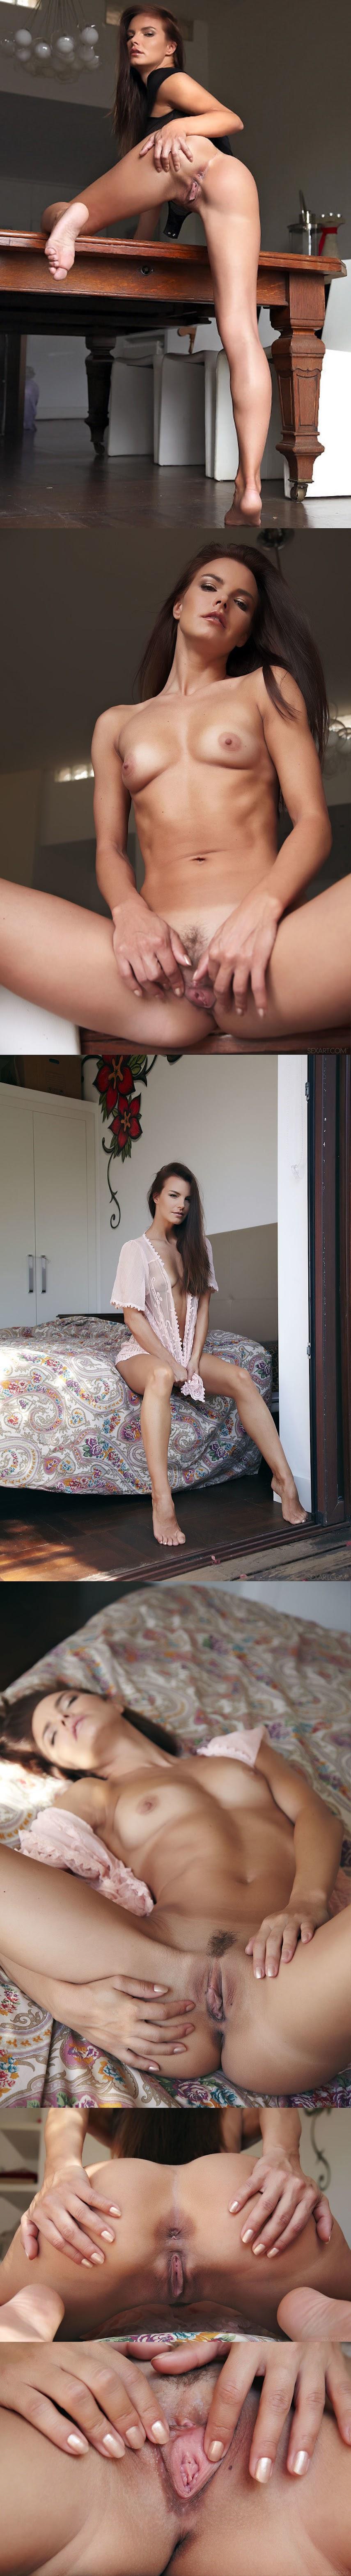 SA_Suzie_Carina.zip-jk- Sexart  Suzie Carina